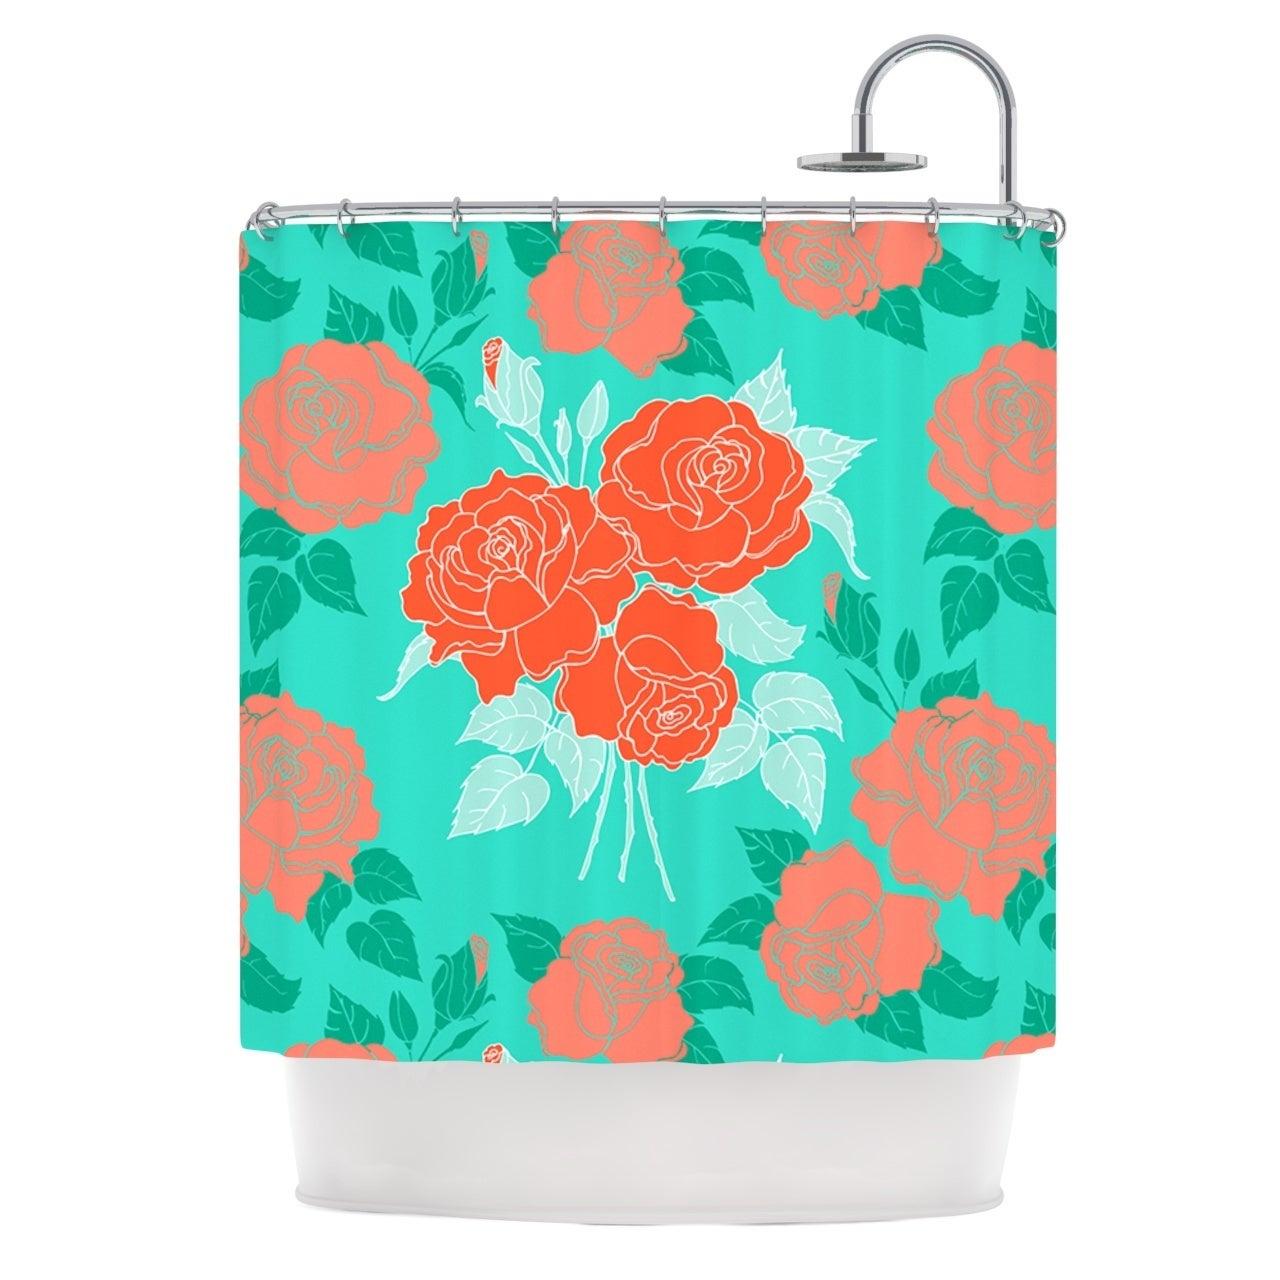 Shop KESS InHouse Anneline Sophia Summer Rose Orange Teal Green Shower Curtain 69x70